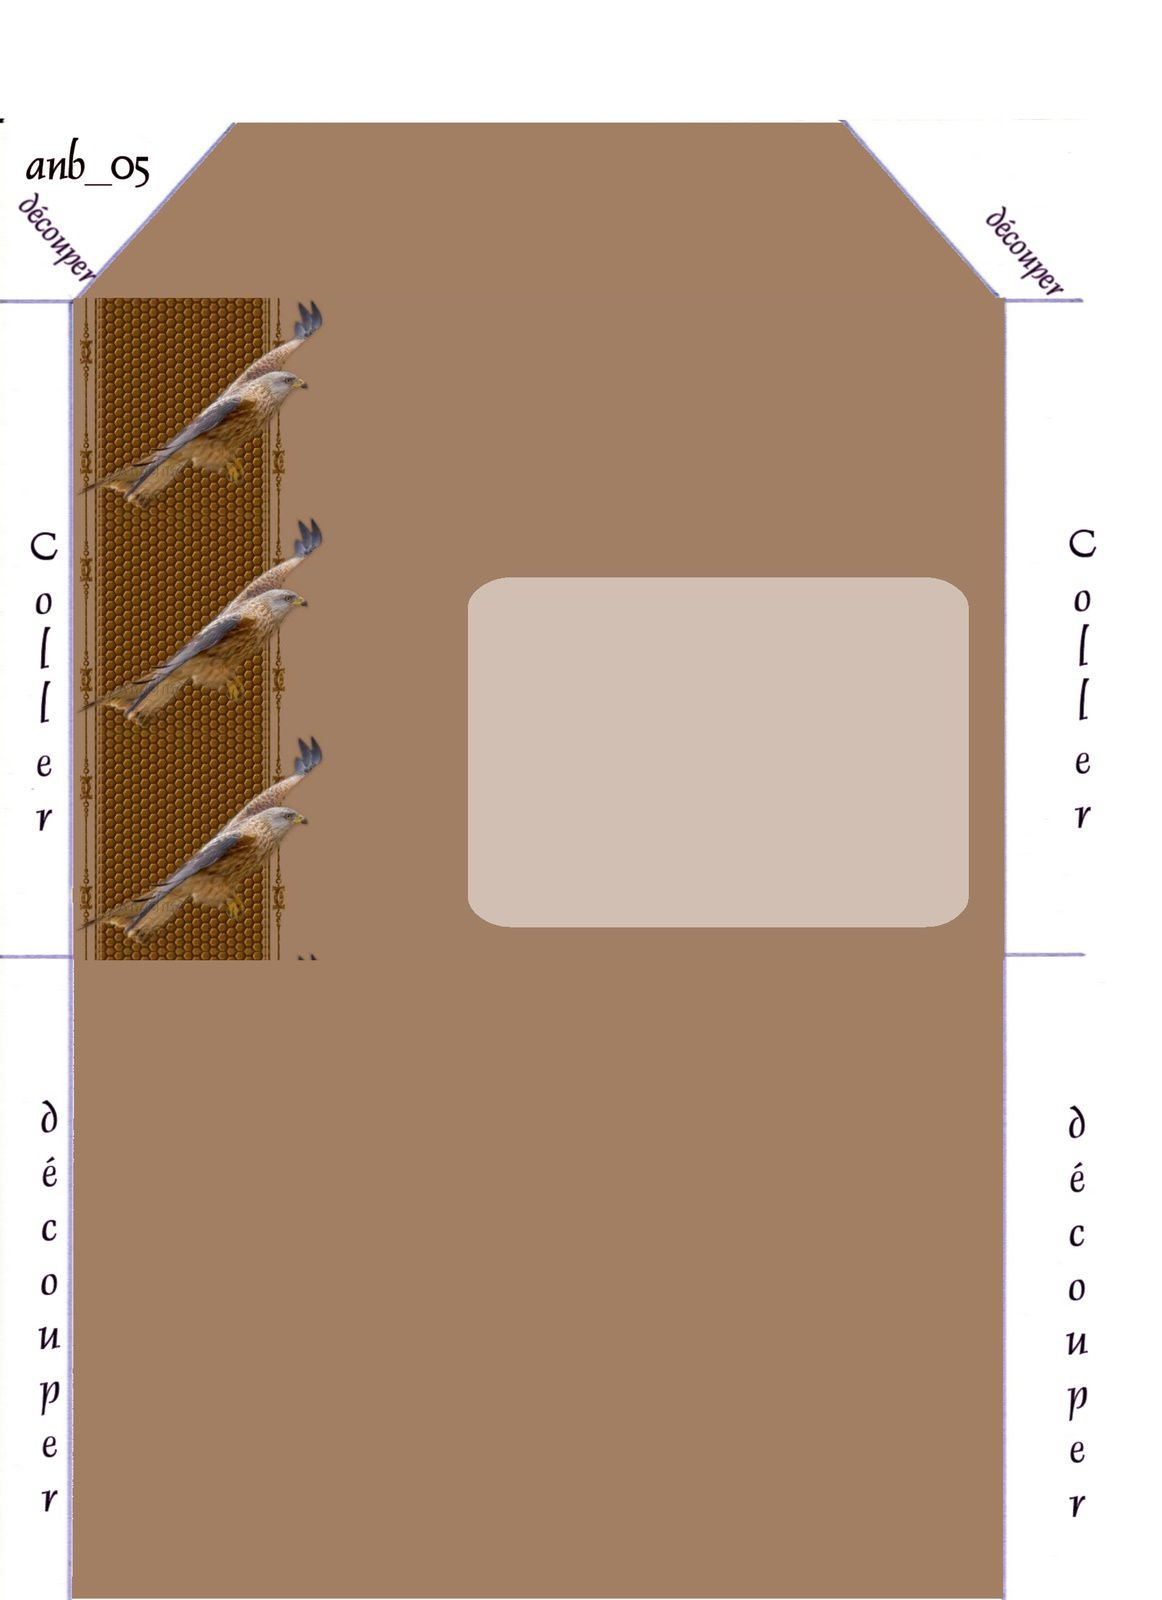 Aigle Oiseau Incredimail &amp&#x3B; Papier A4 h l &amp&#x3B; outlook &amp&#x3B; enveloppe &amp&#x3B; 2 cartes A5 &amp&#x3B; signets 3 langues  ois_saphiere_bird_40